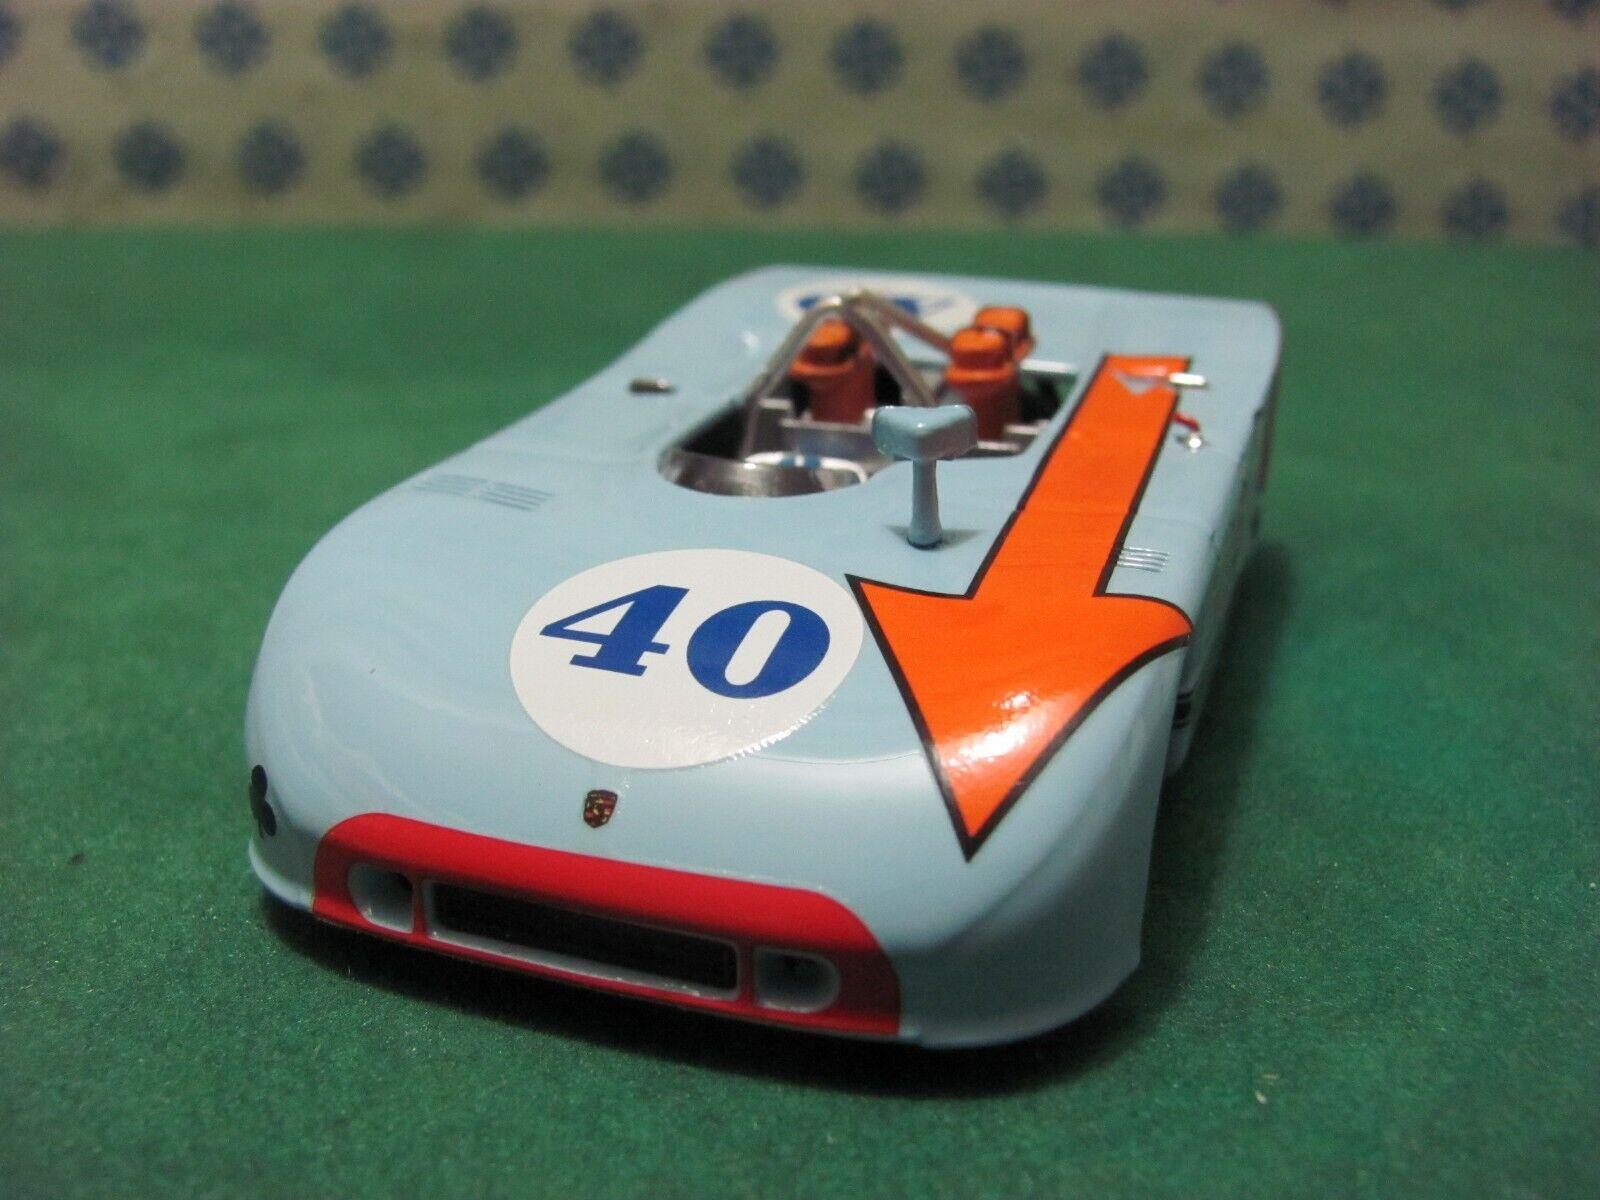 PORSCHE 9083  3000cc. Spyder   Targa Florio 1970  143 Best 9033 L.Ed